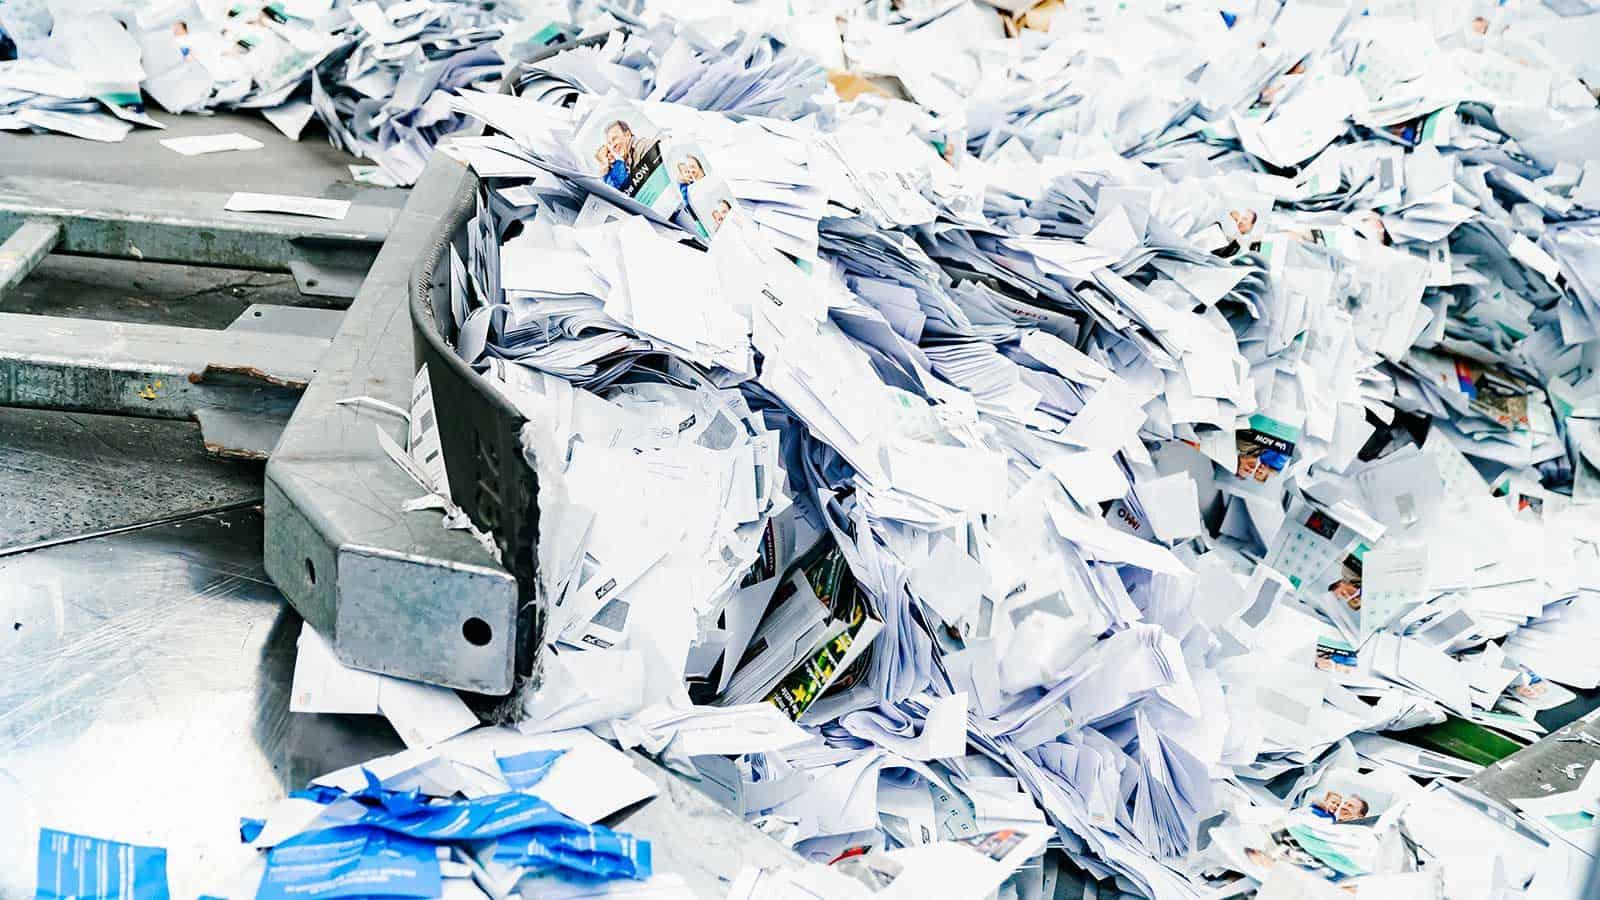 papier-vernietigen-header